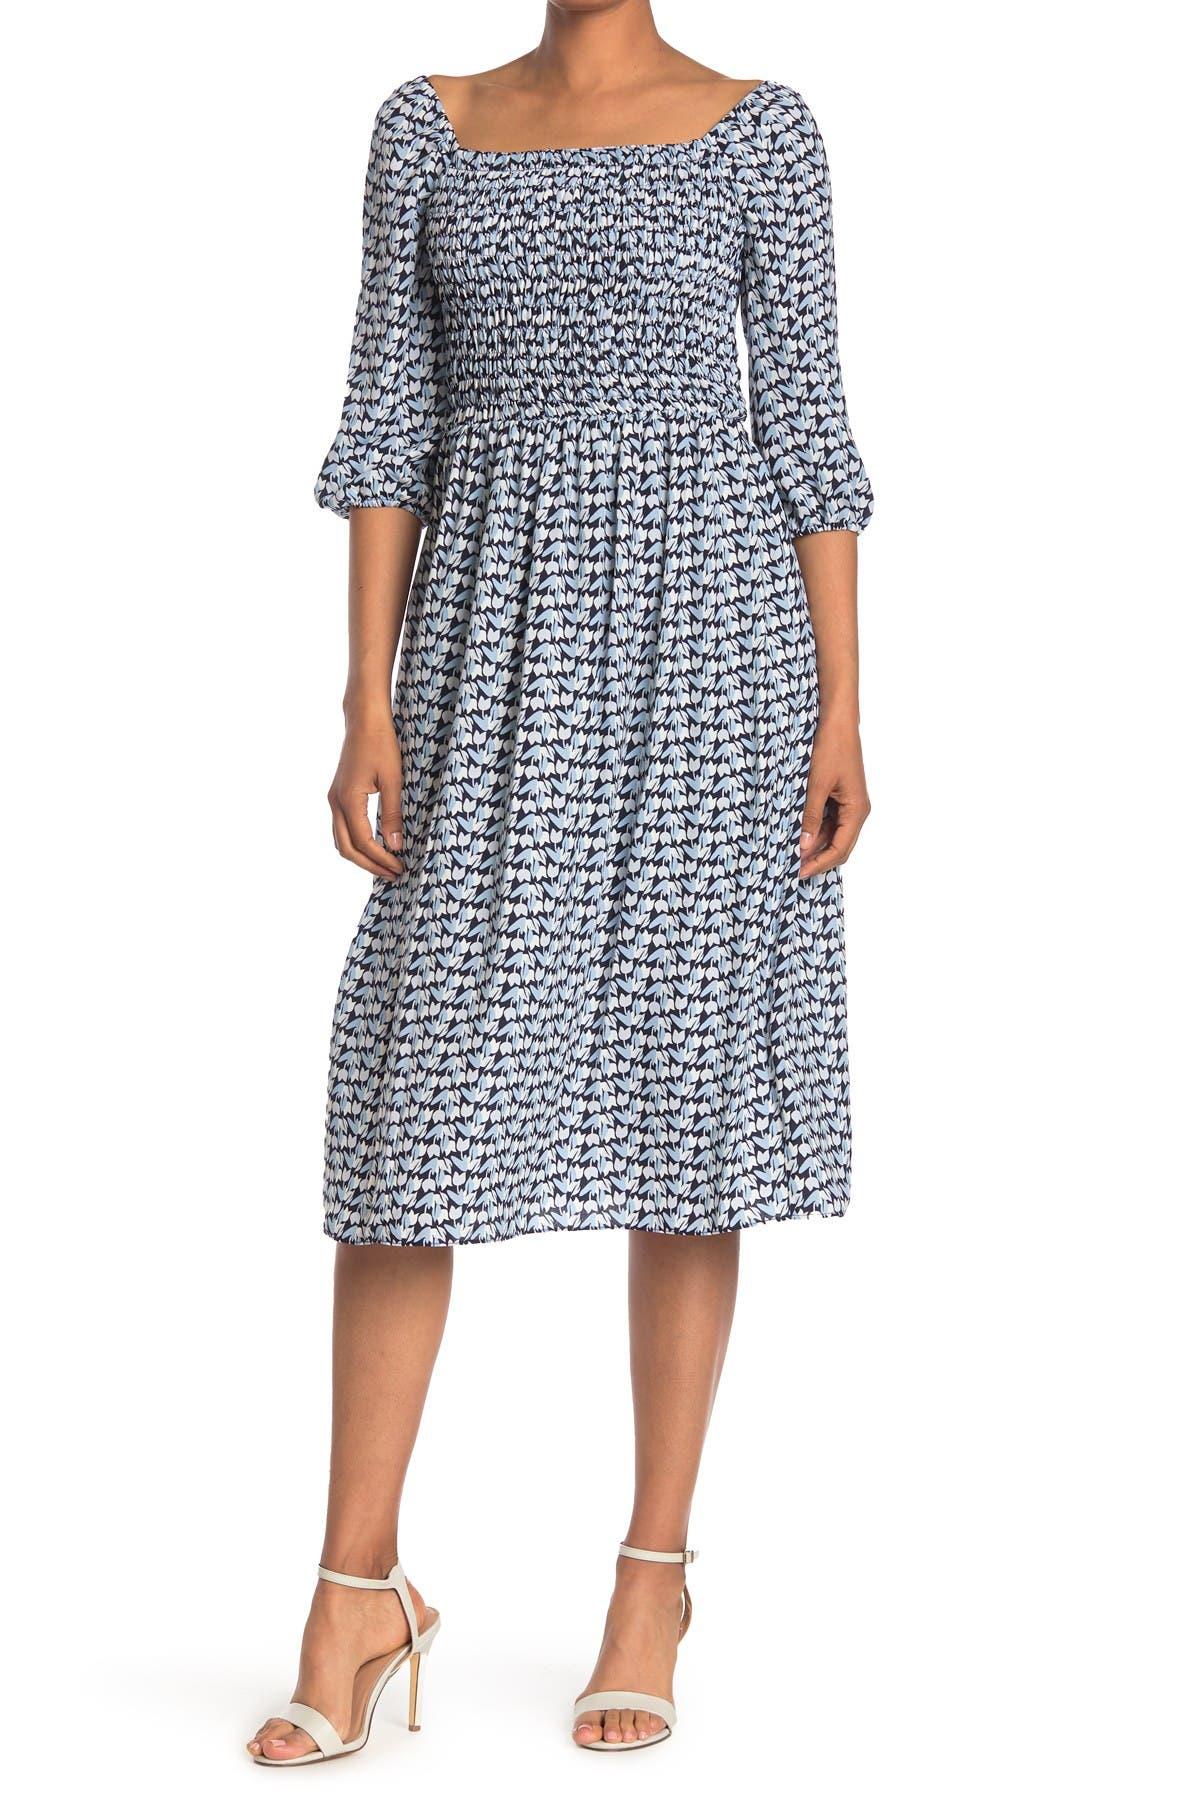 Gabby Skye Womens 3//4 Sleeve V-Neck Floral Print Romper Dress